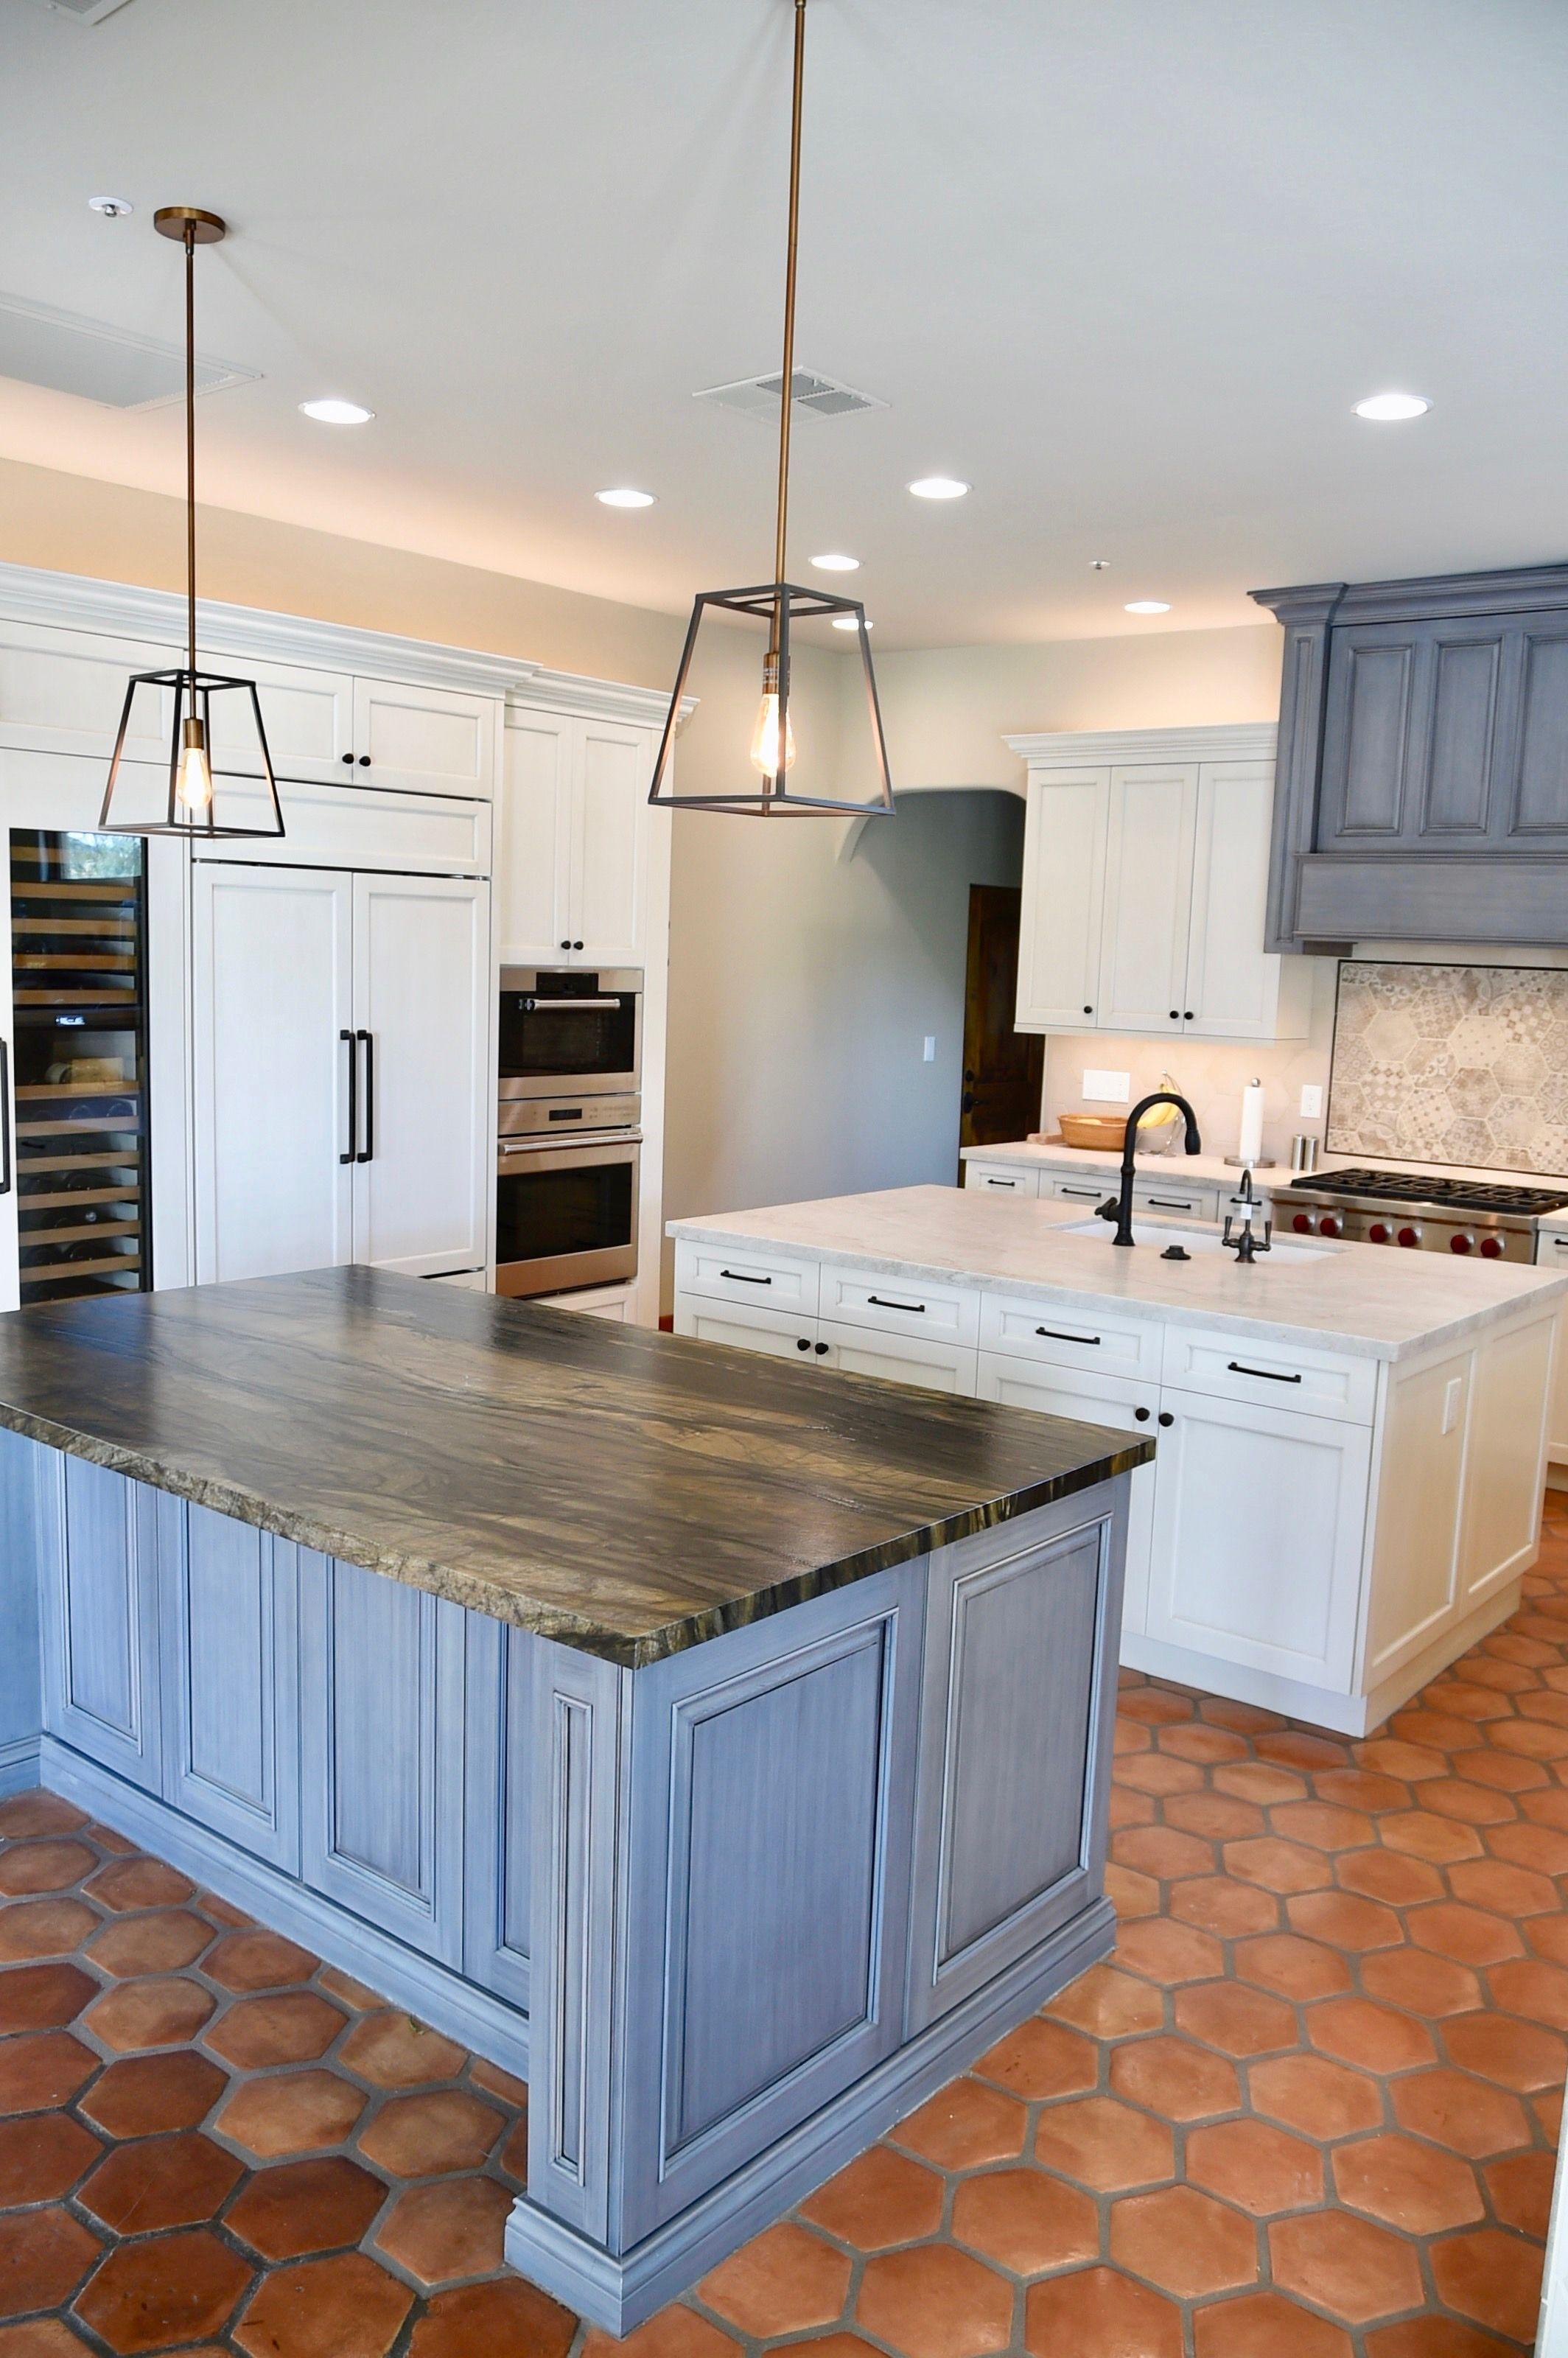 Kitchen remodel white and grey cabinets modern lights taj mahal